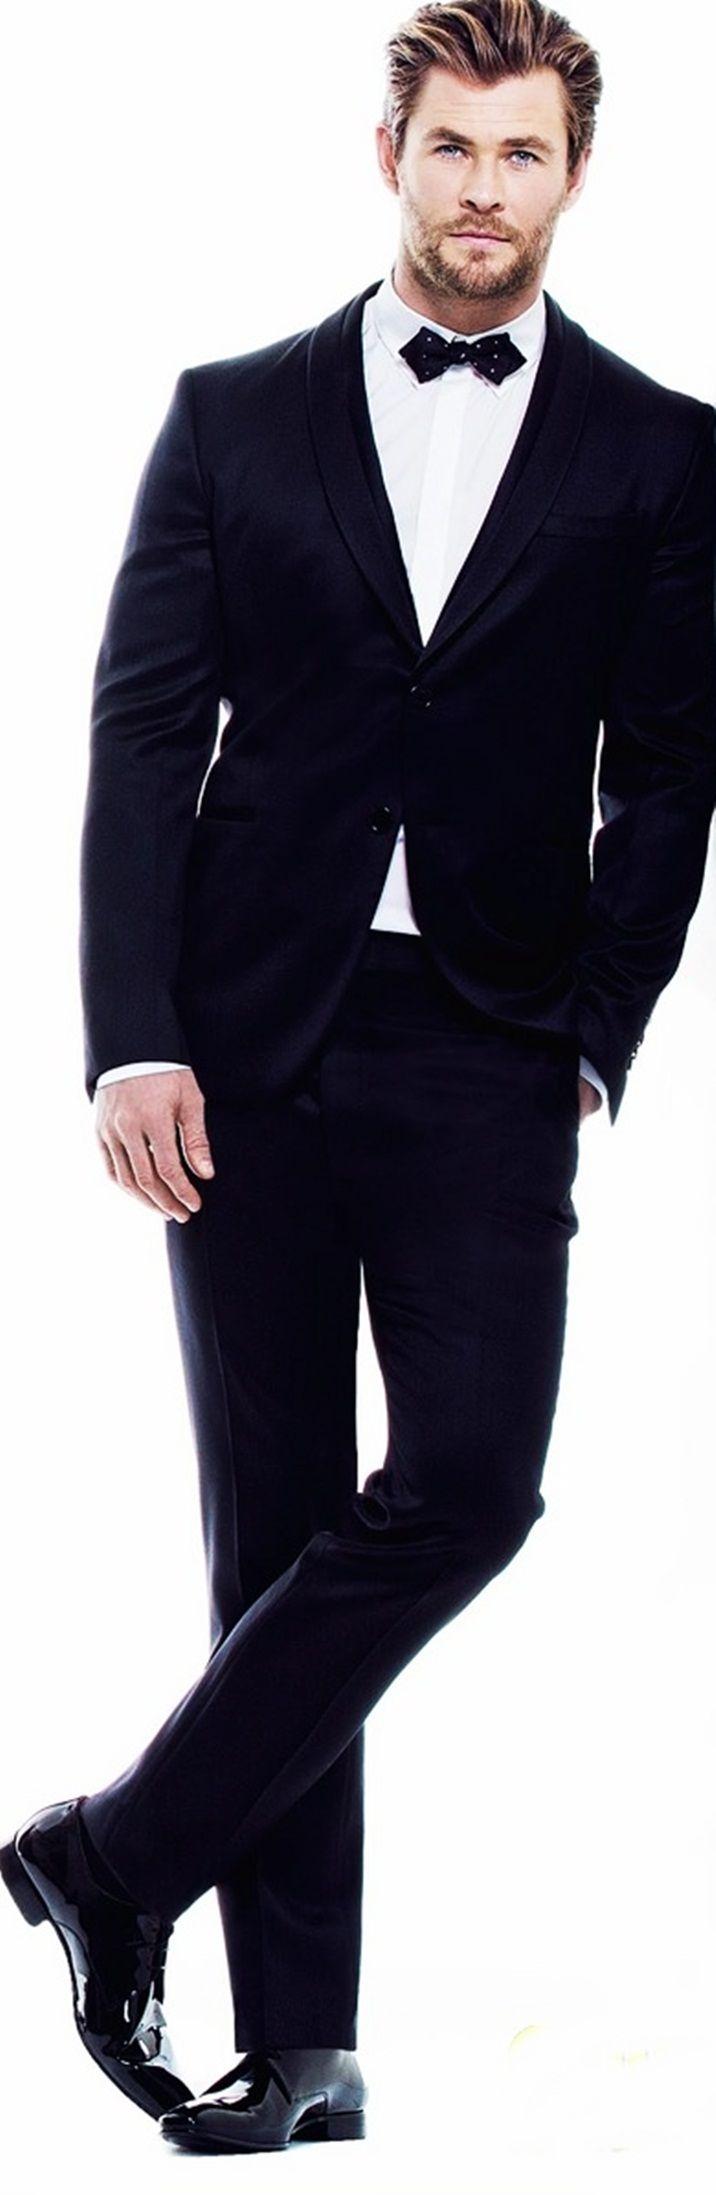 Chris-Hemsworth-moda-masculina-alexandre-taleb-6